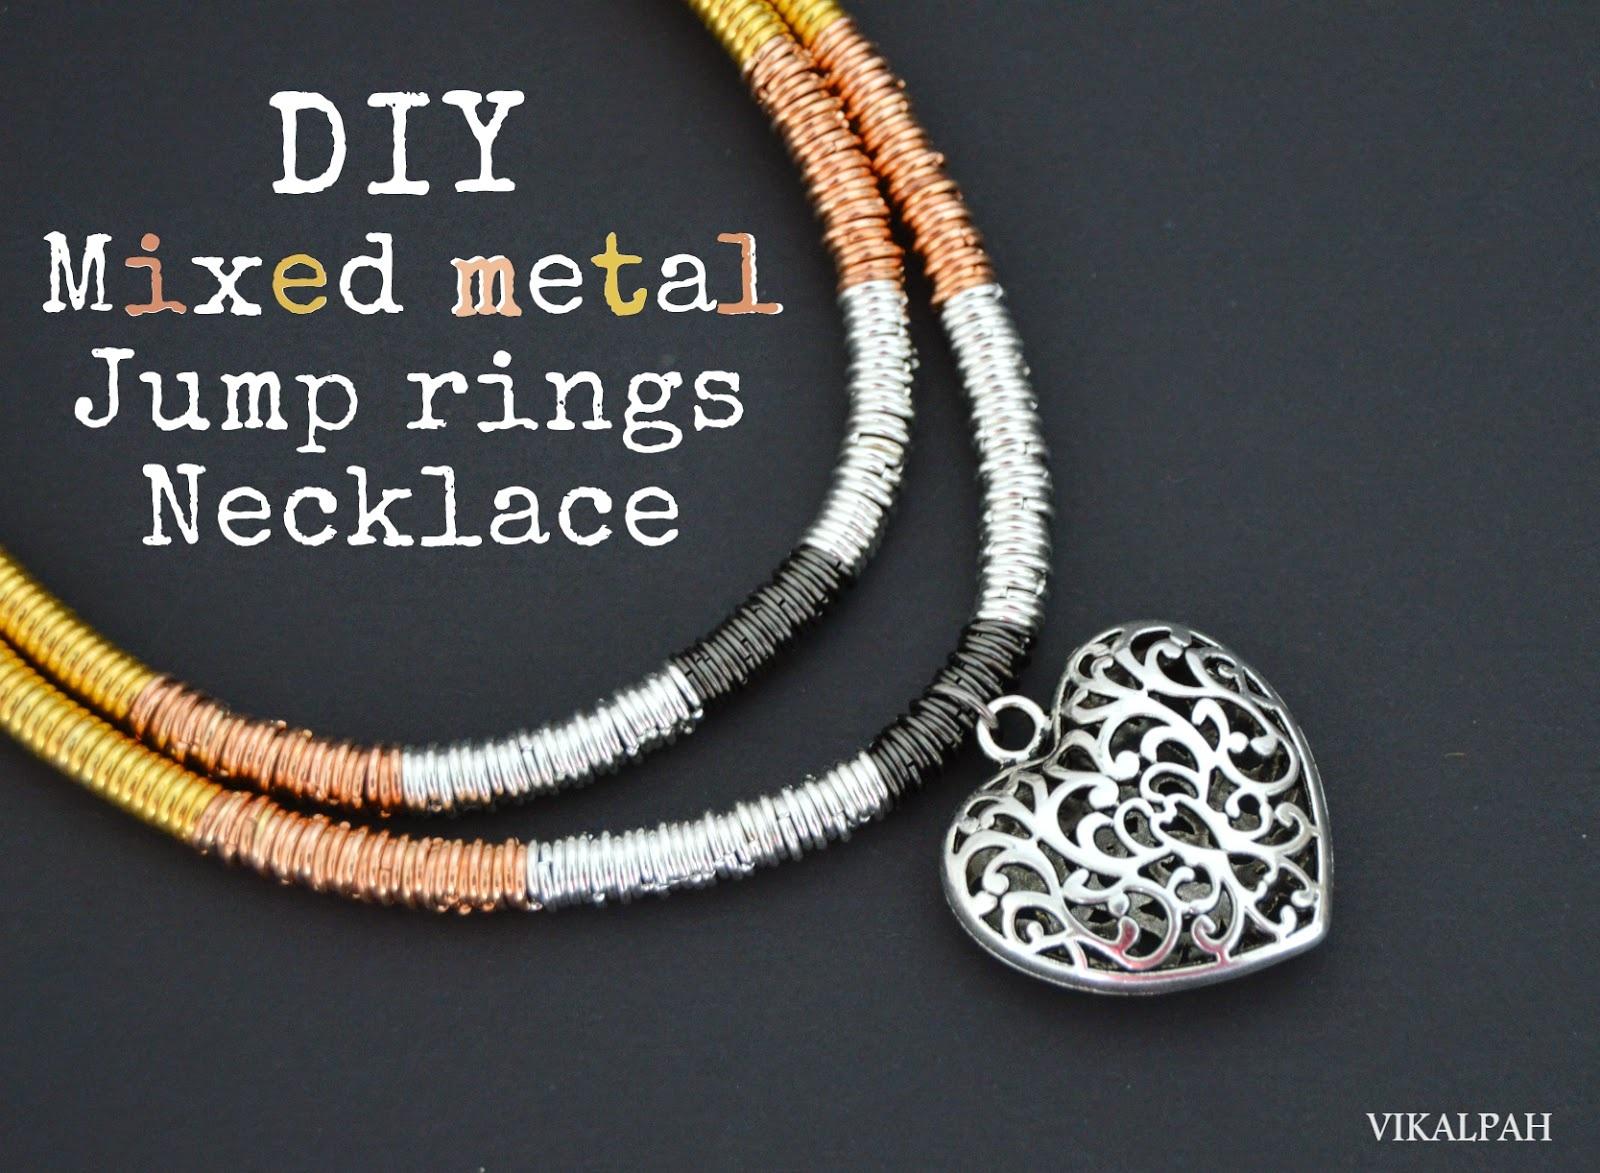 Mixed metal jump rings Necklace DIY